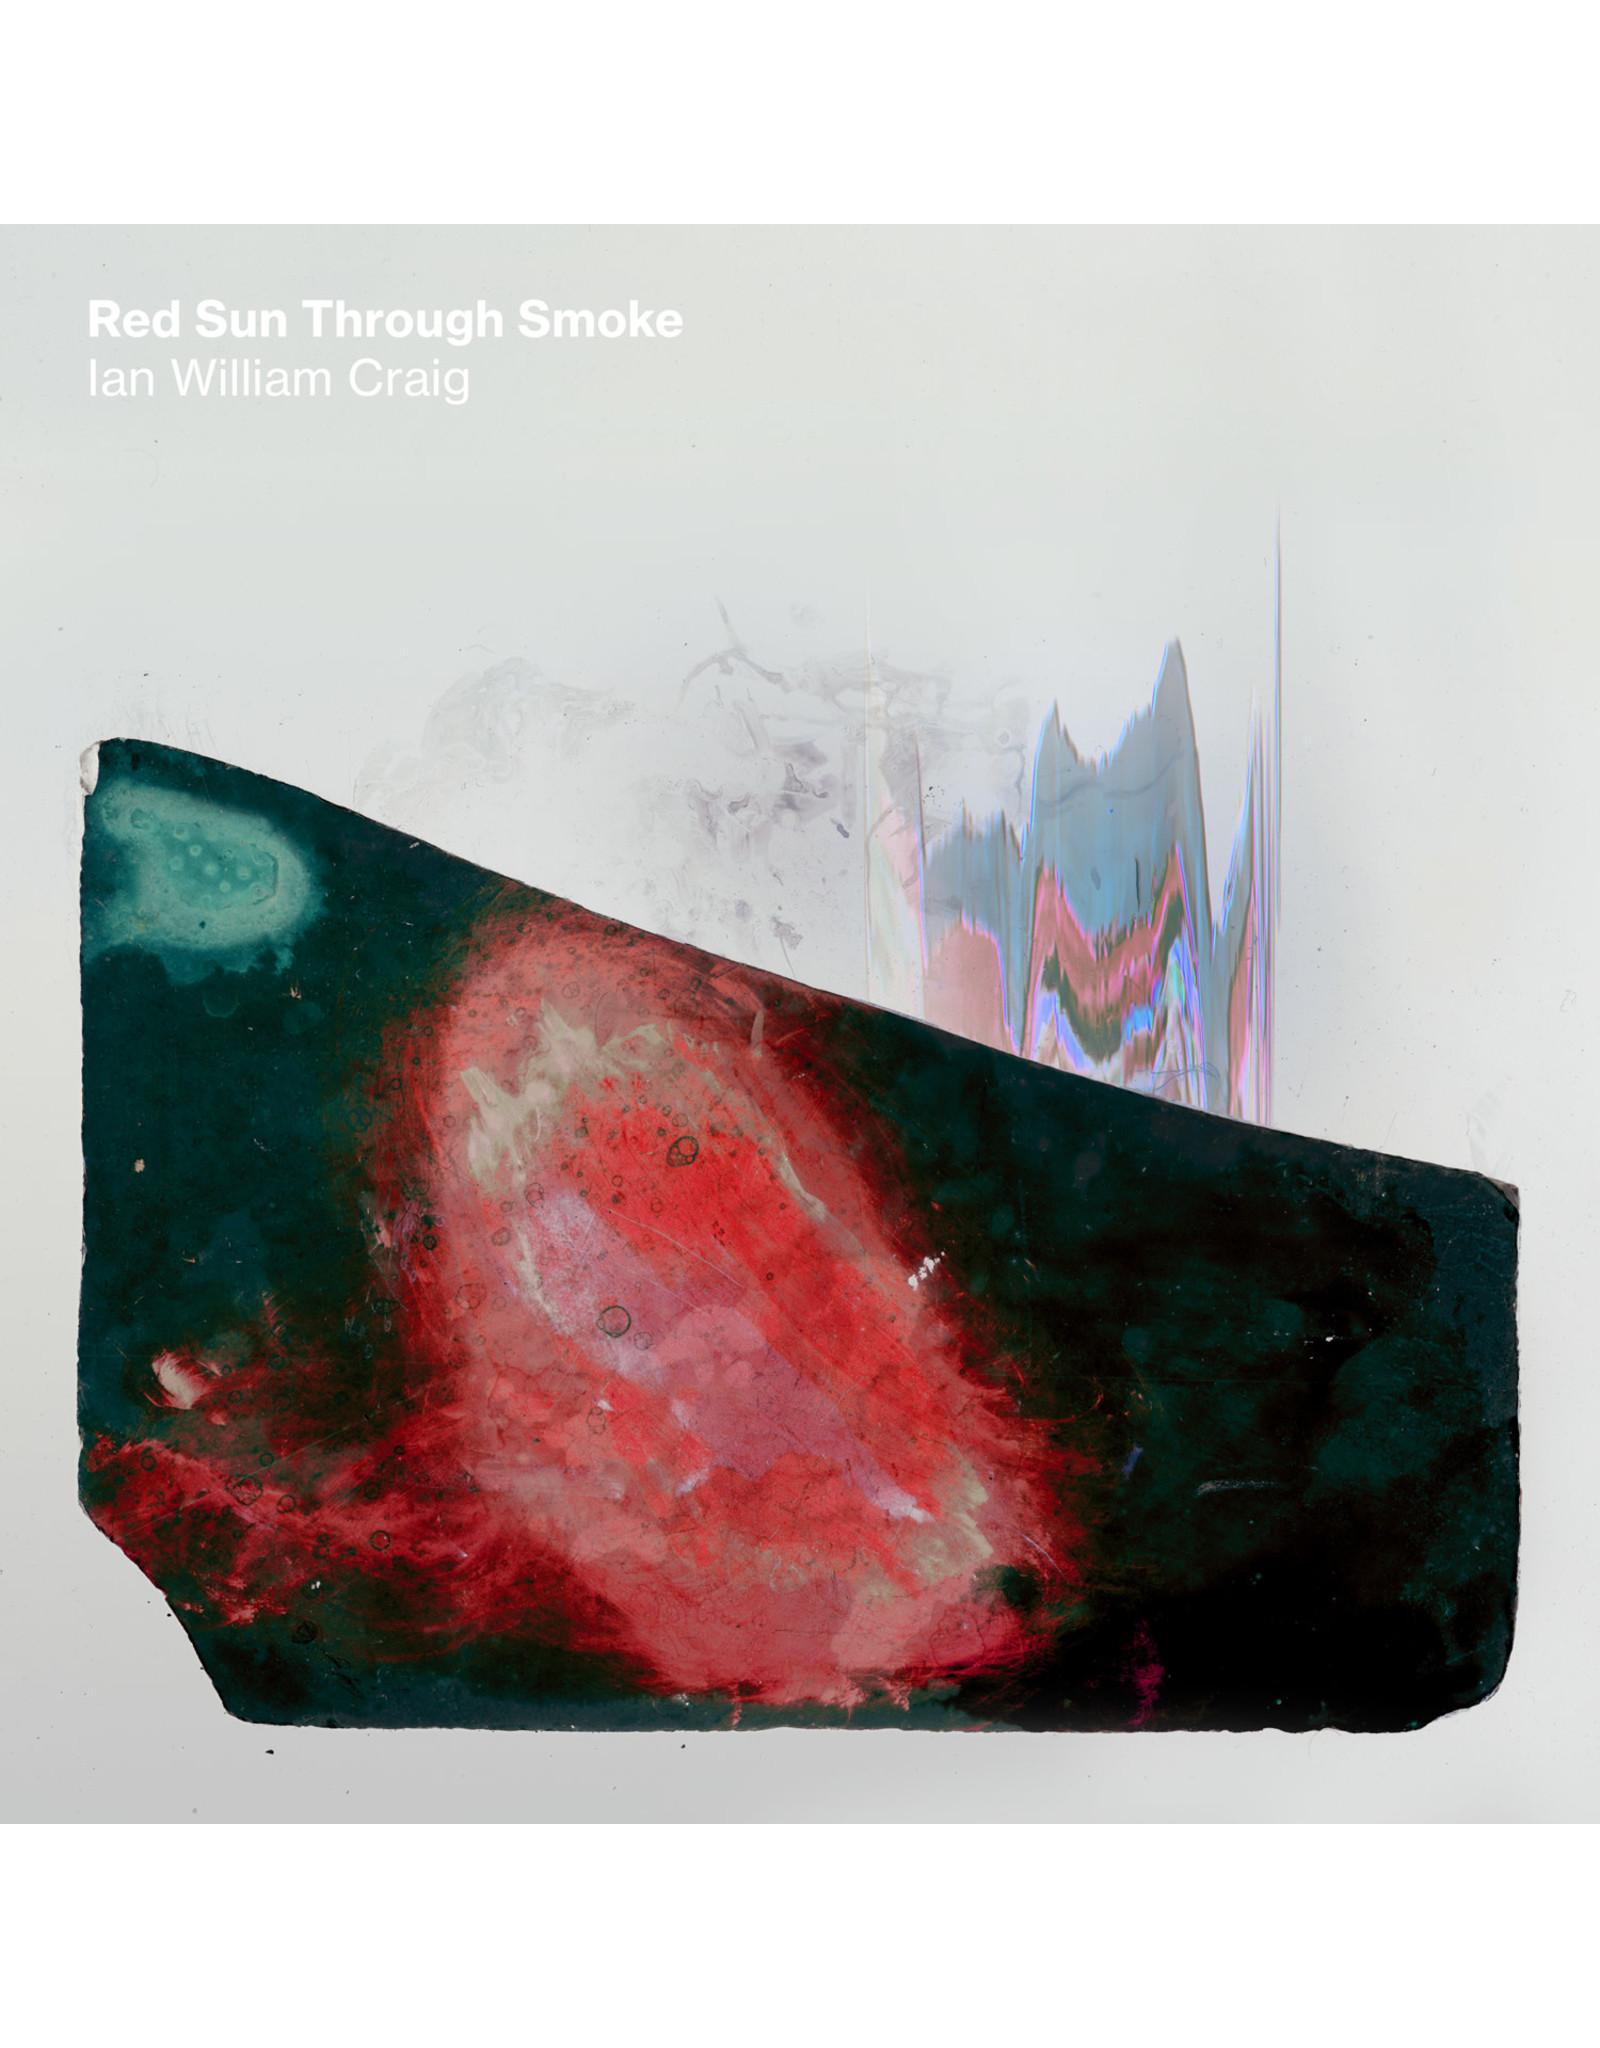 130701 Craig, Ian William: Red Sun Through Smoke LP